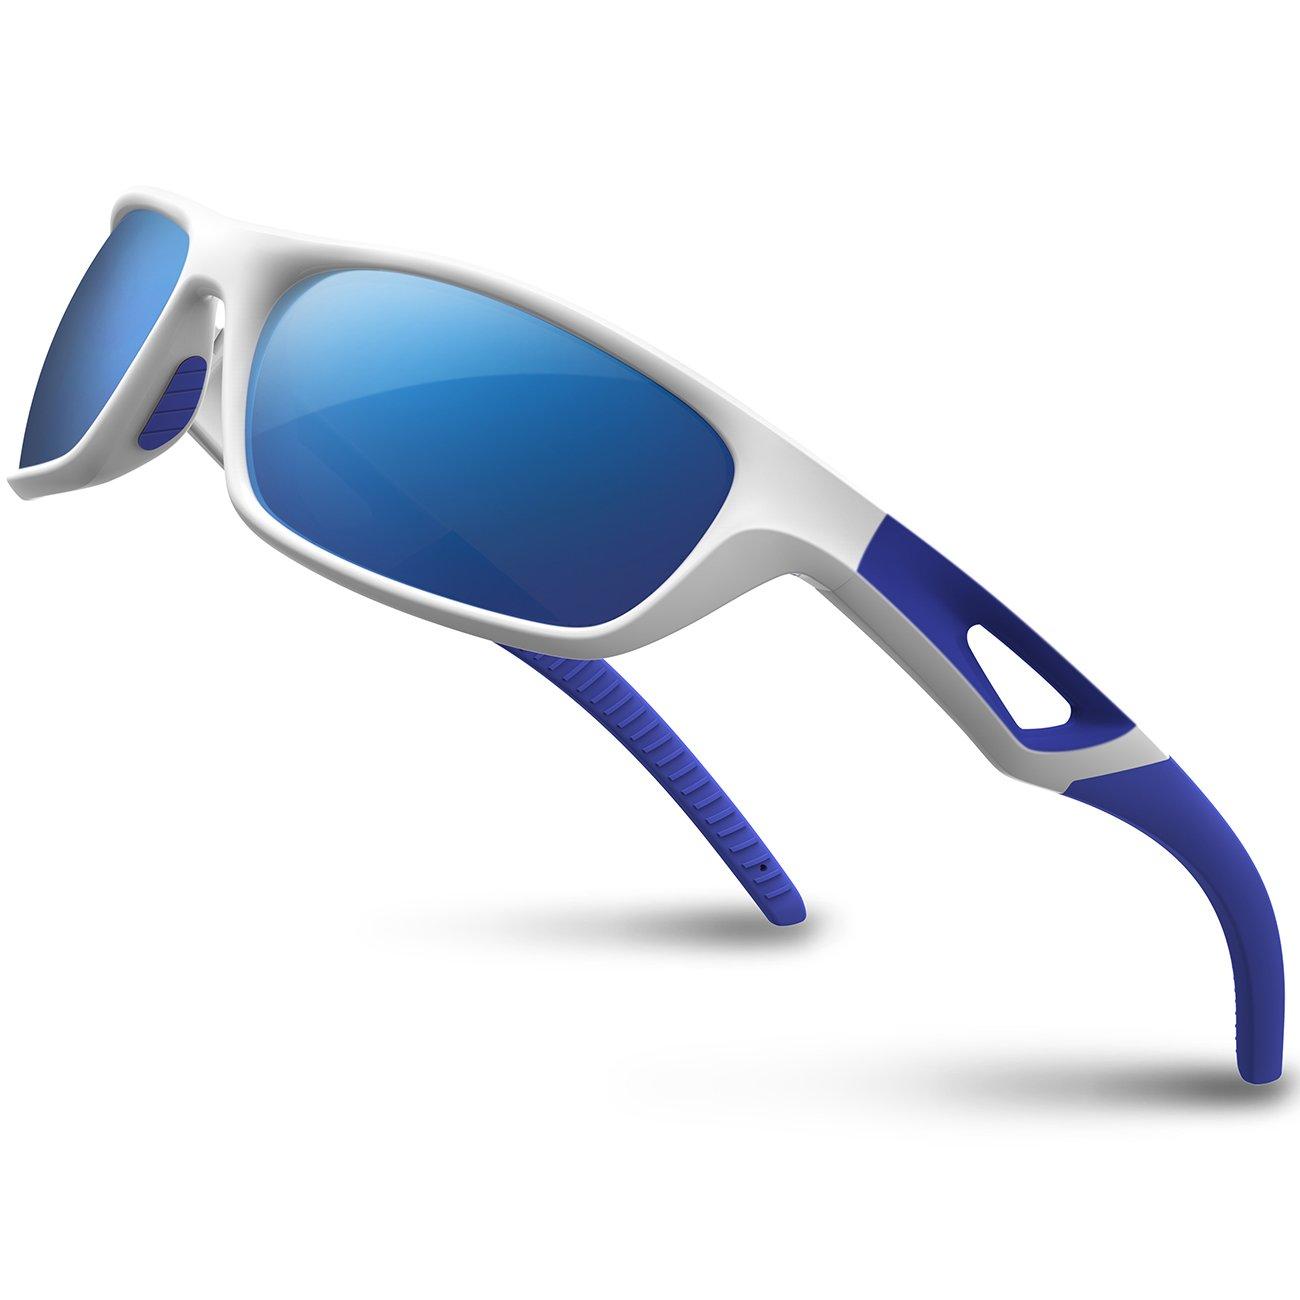 RIVBOS Polarized Sports Sunglasses Driving Sun Glasses Shades for Men Women Tr 90 Unbreakable Frame for Cycling Baseball Running Rb831 (White&Blue Mirror Lens)